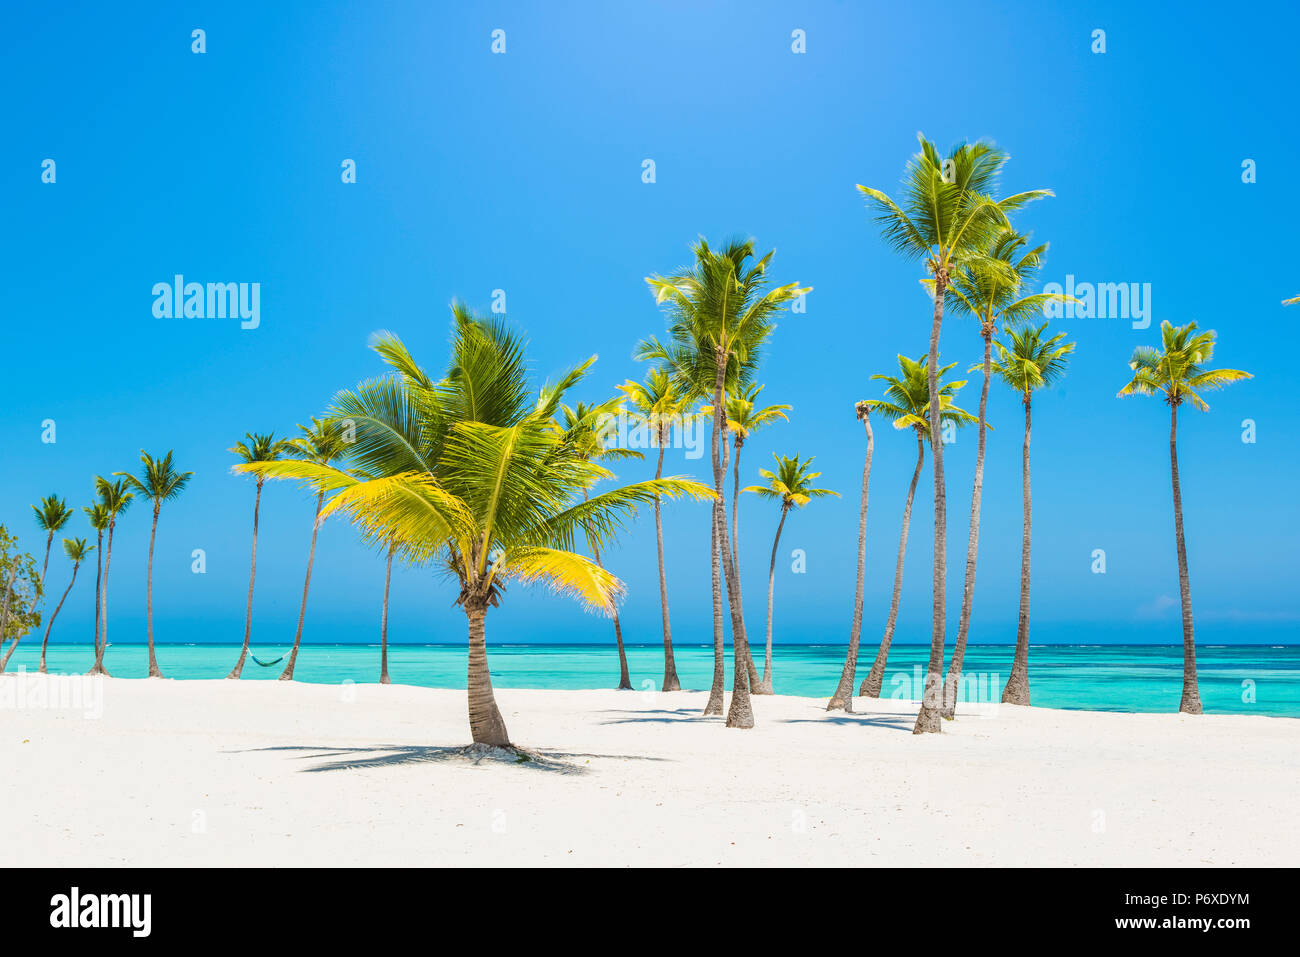 Juanillo Beach (playa Juanillo), Punta Cana, République dominicaine. Photo Stock